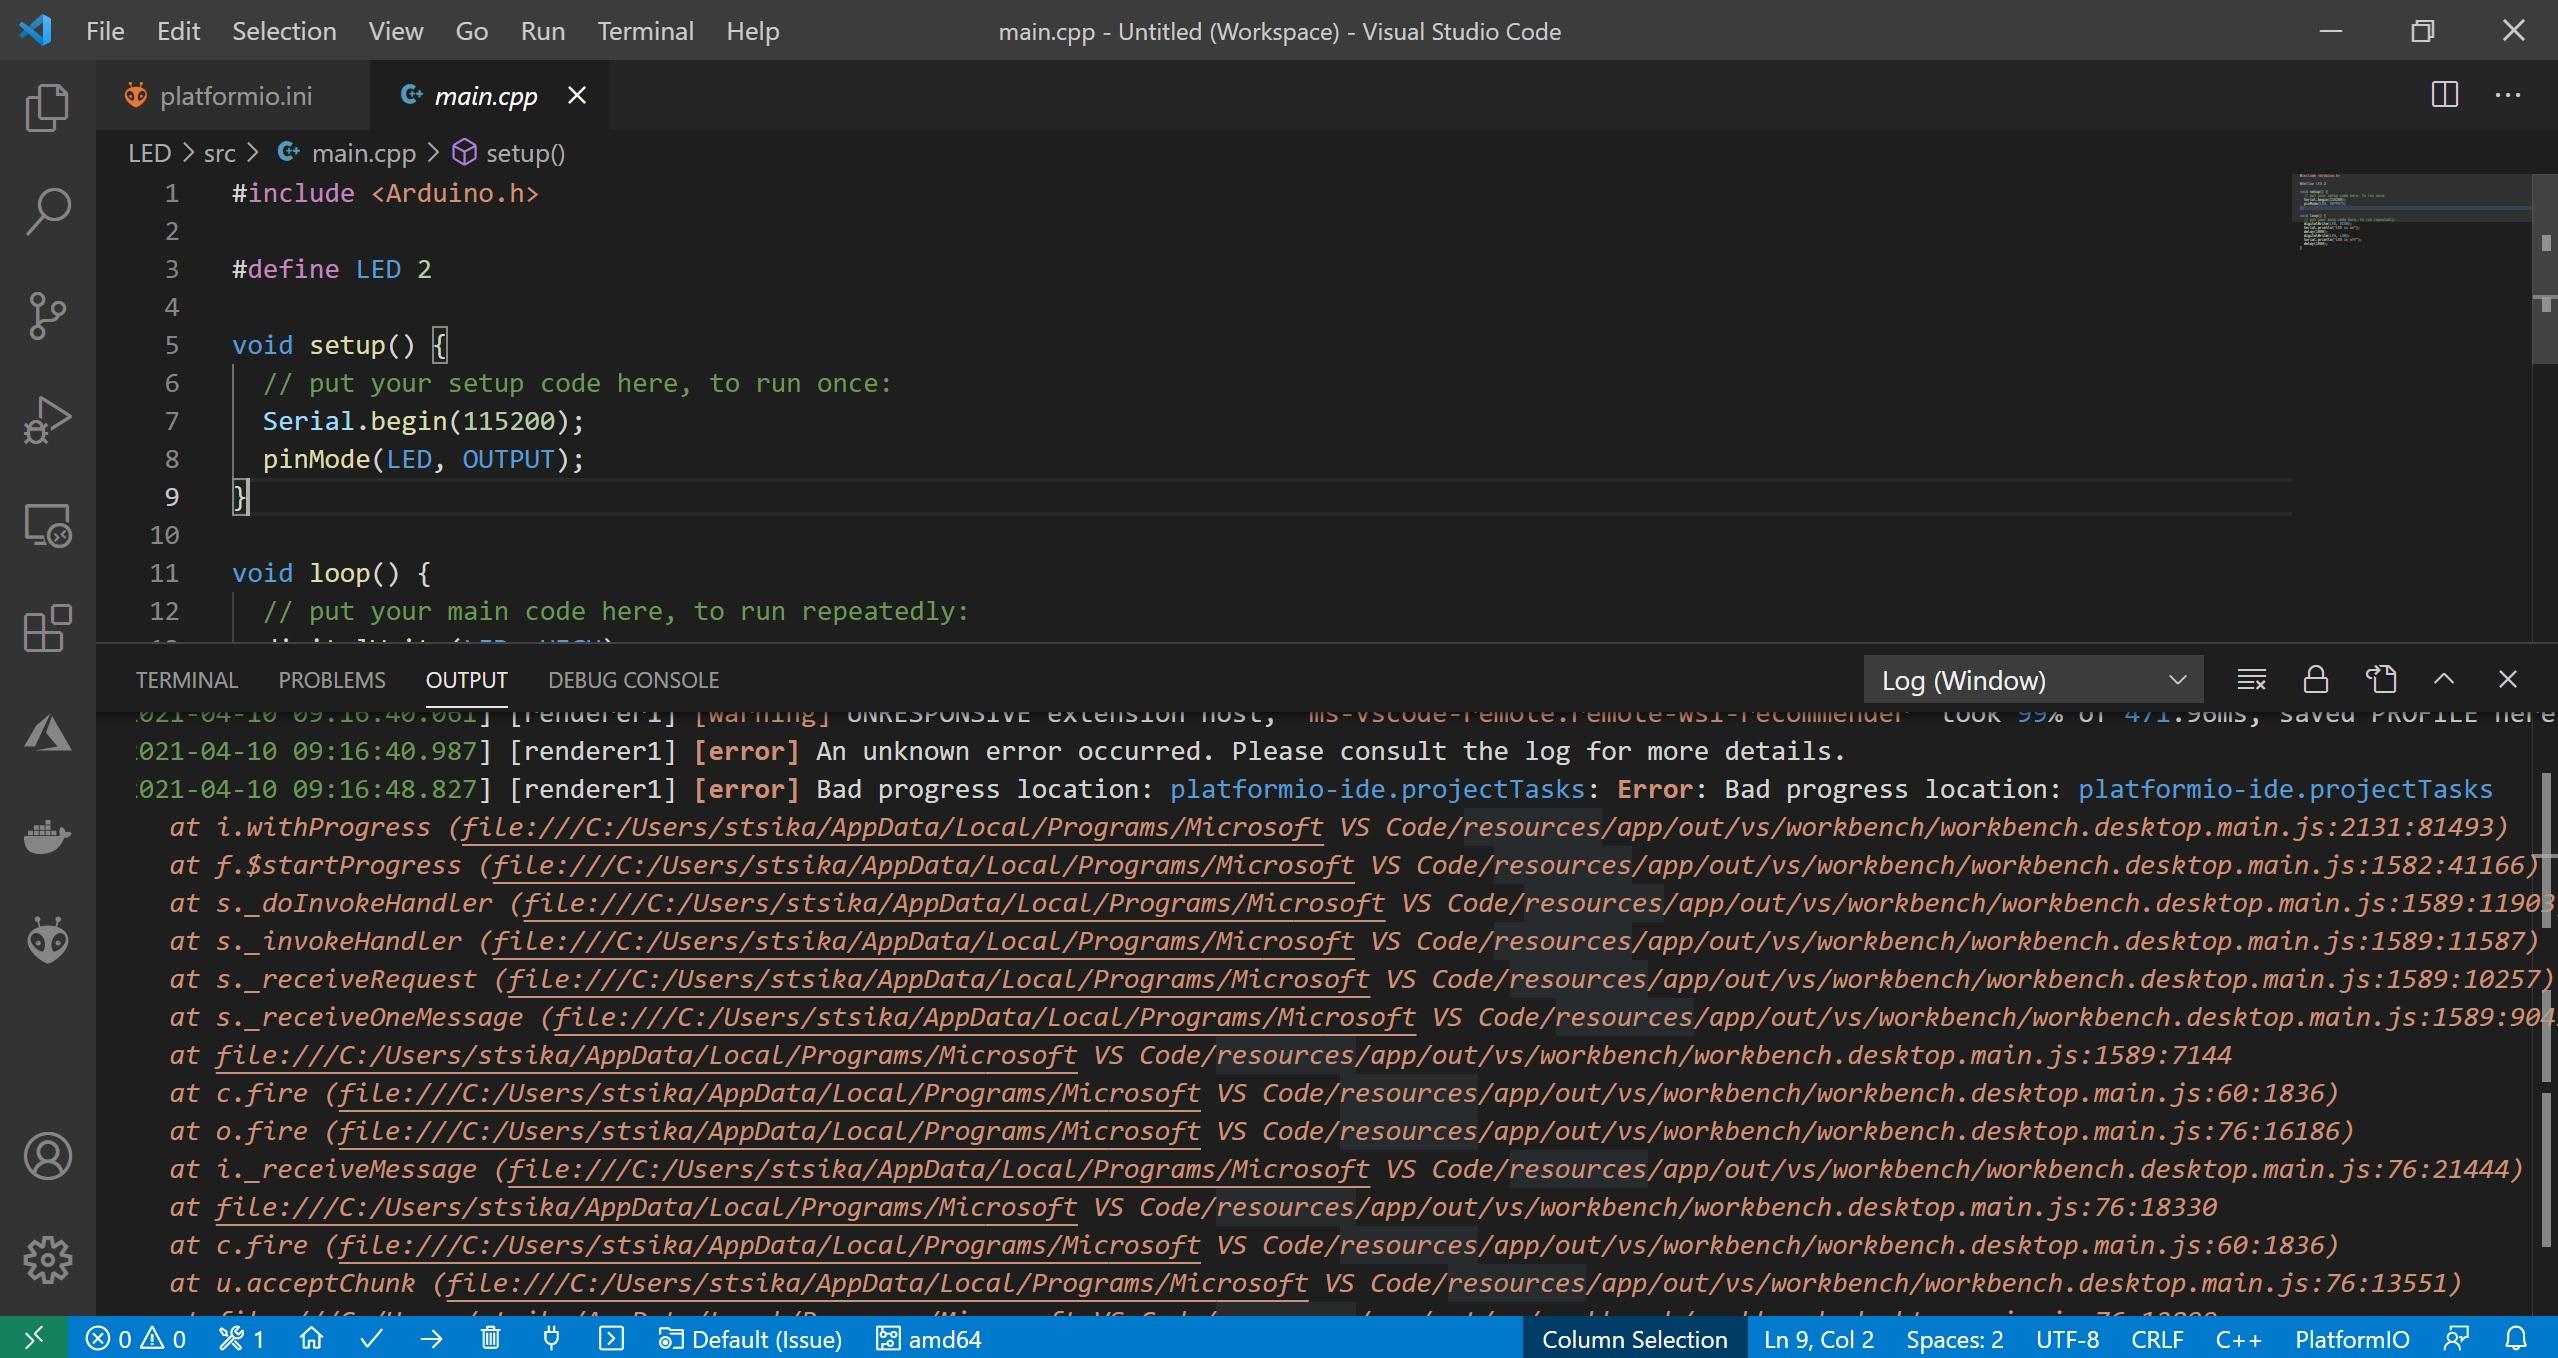 platformio VS code issue